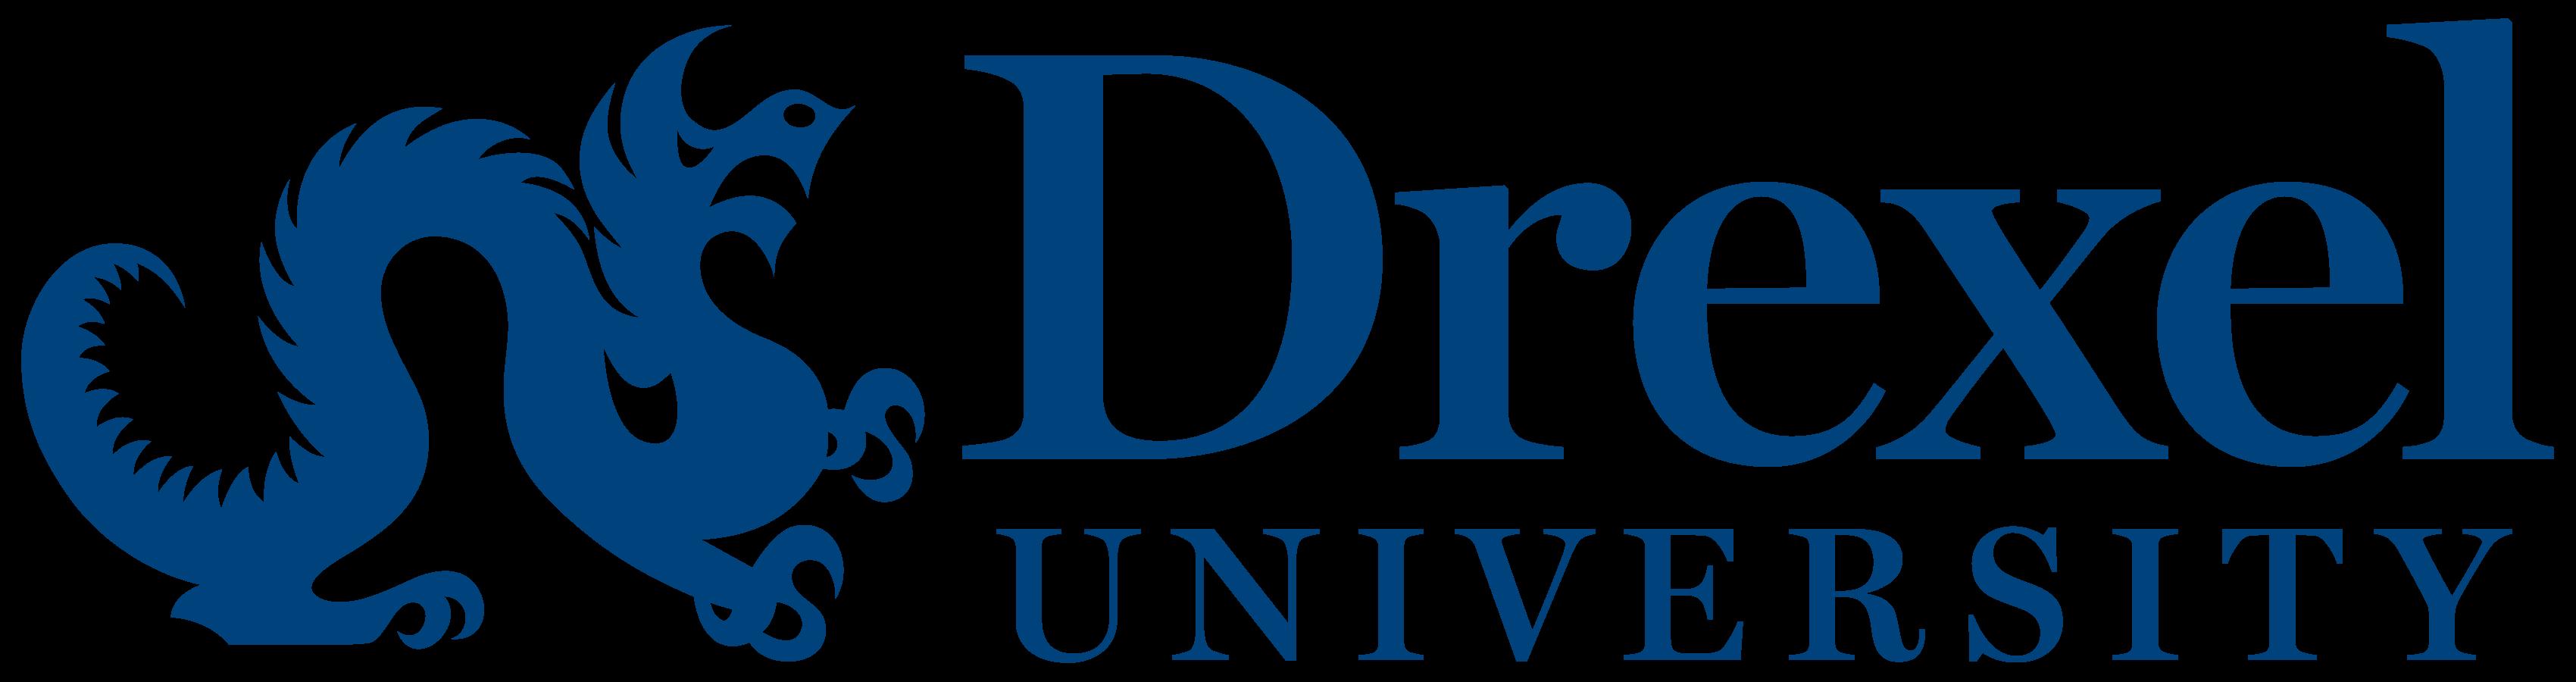 Drexel University- Accreditation, Applying, Tuition